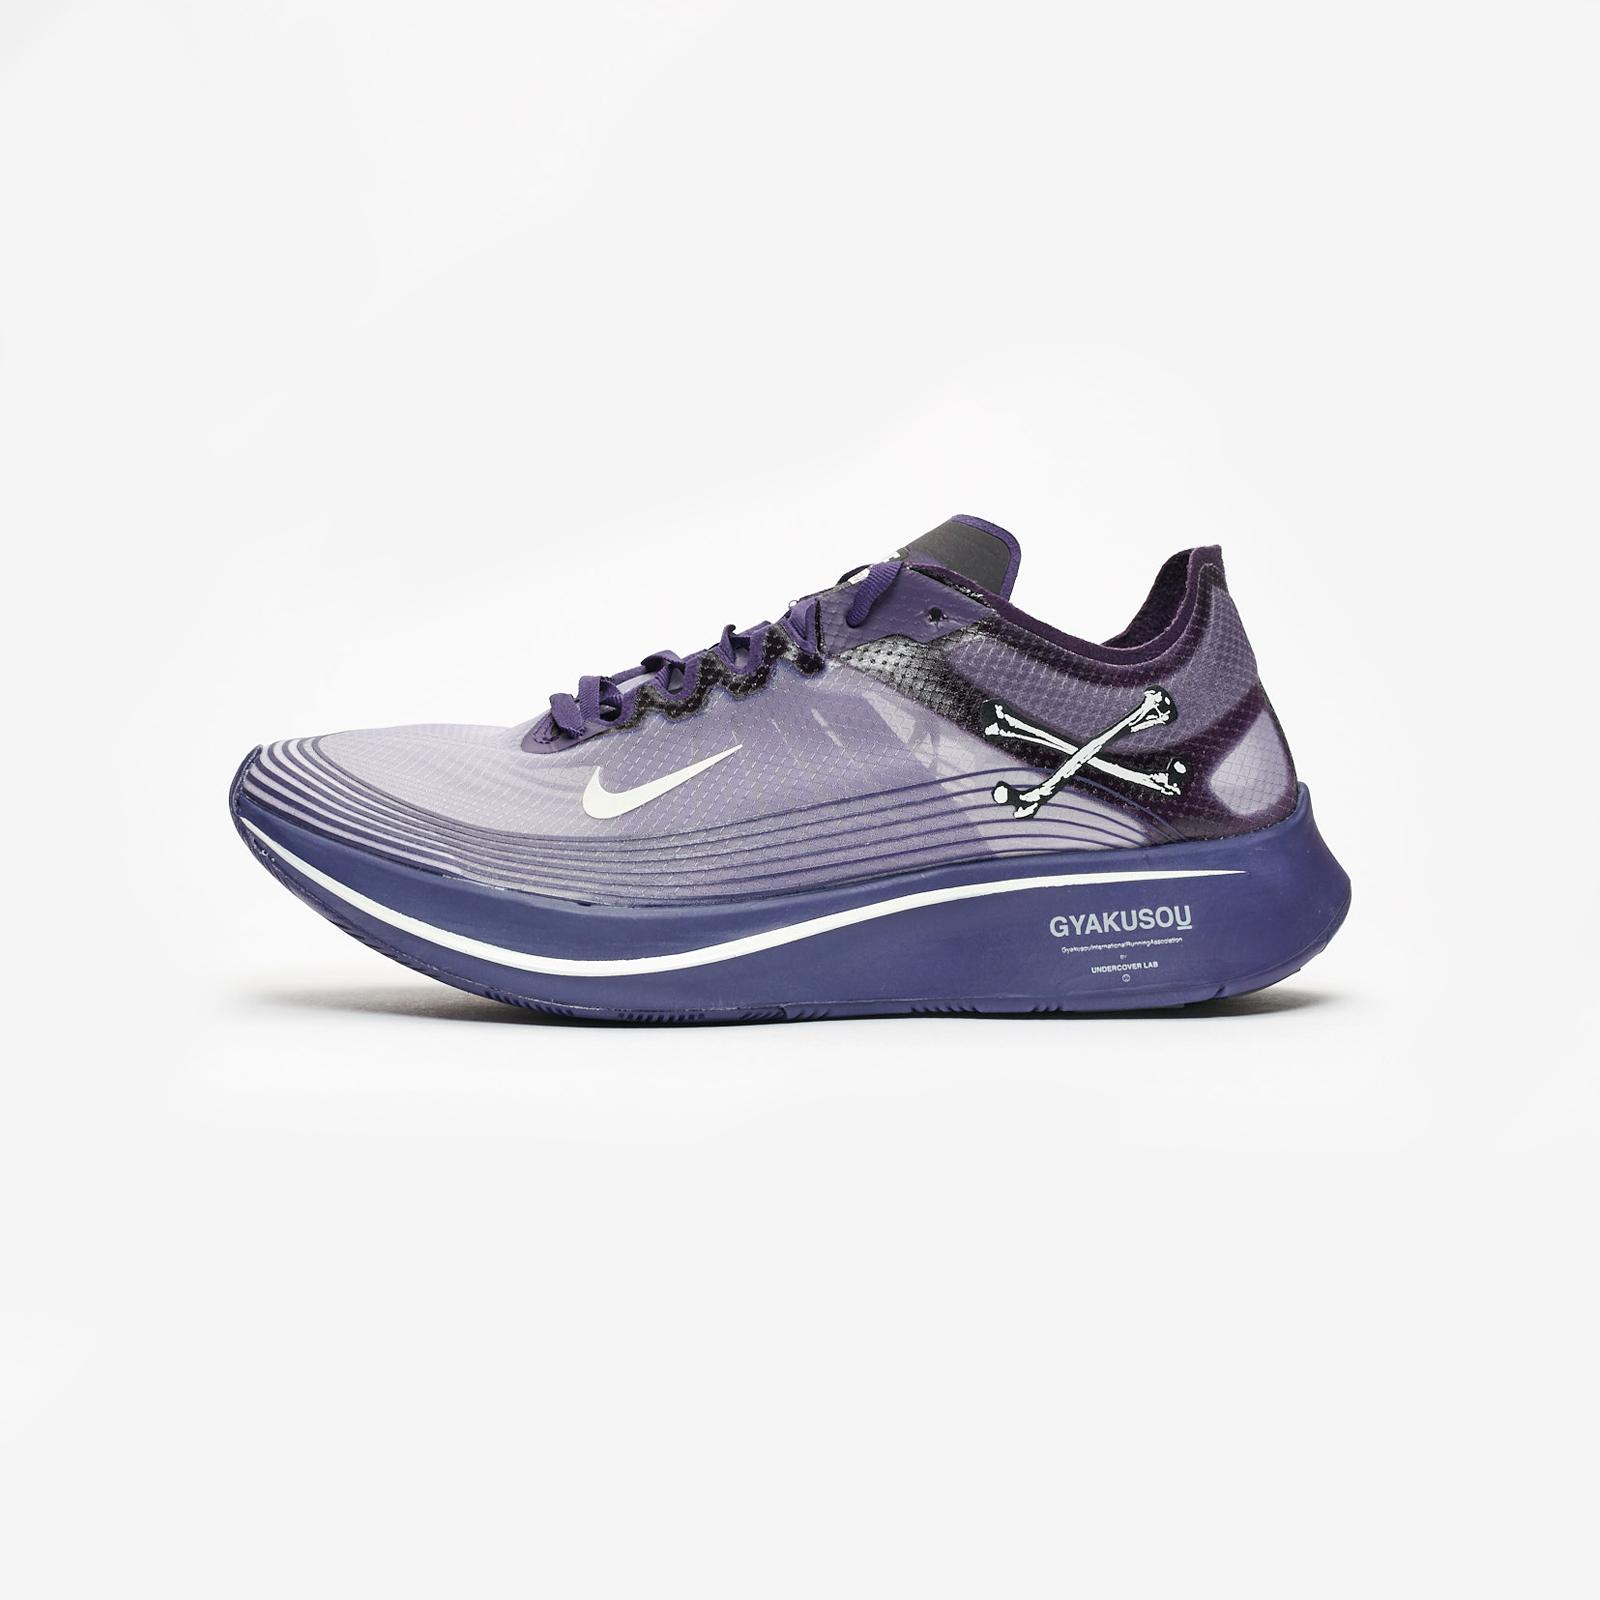 c4975cc2e05d Nike Zoom Fly   Gyakusou - Ar4349-500 - Sneakersnstuff